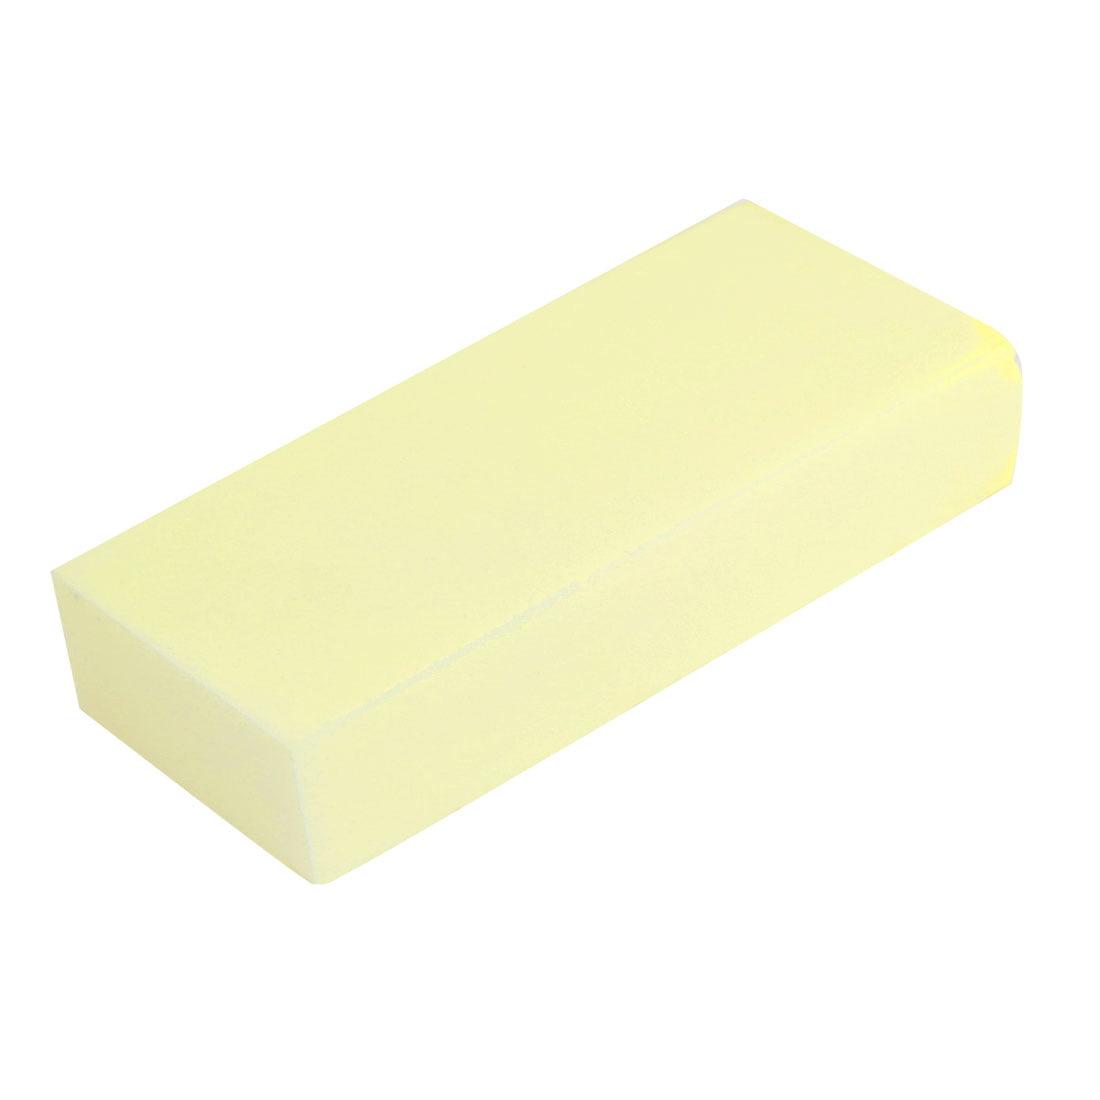 Durable Practical Water Absorbent Car Wash Sponge Block Yellow